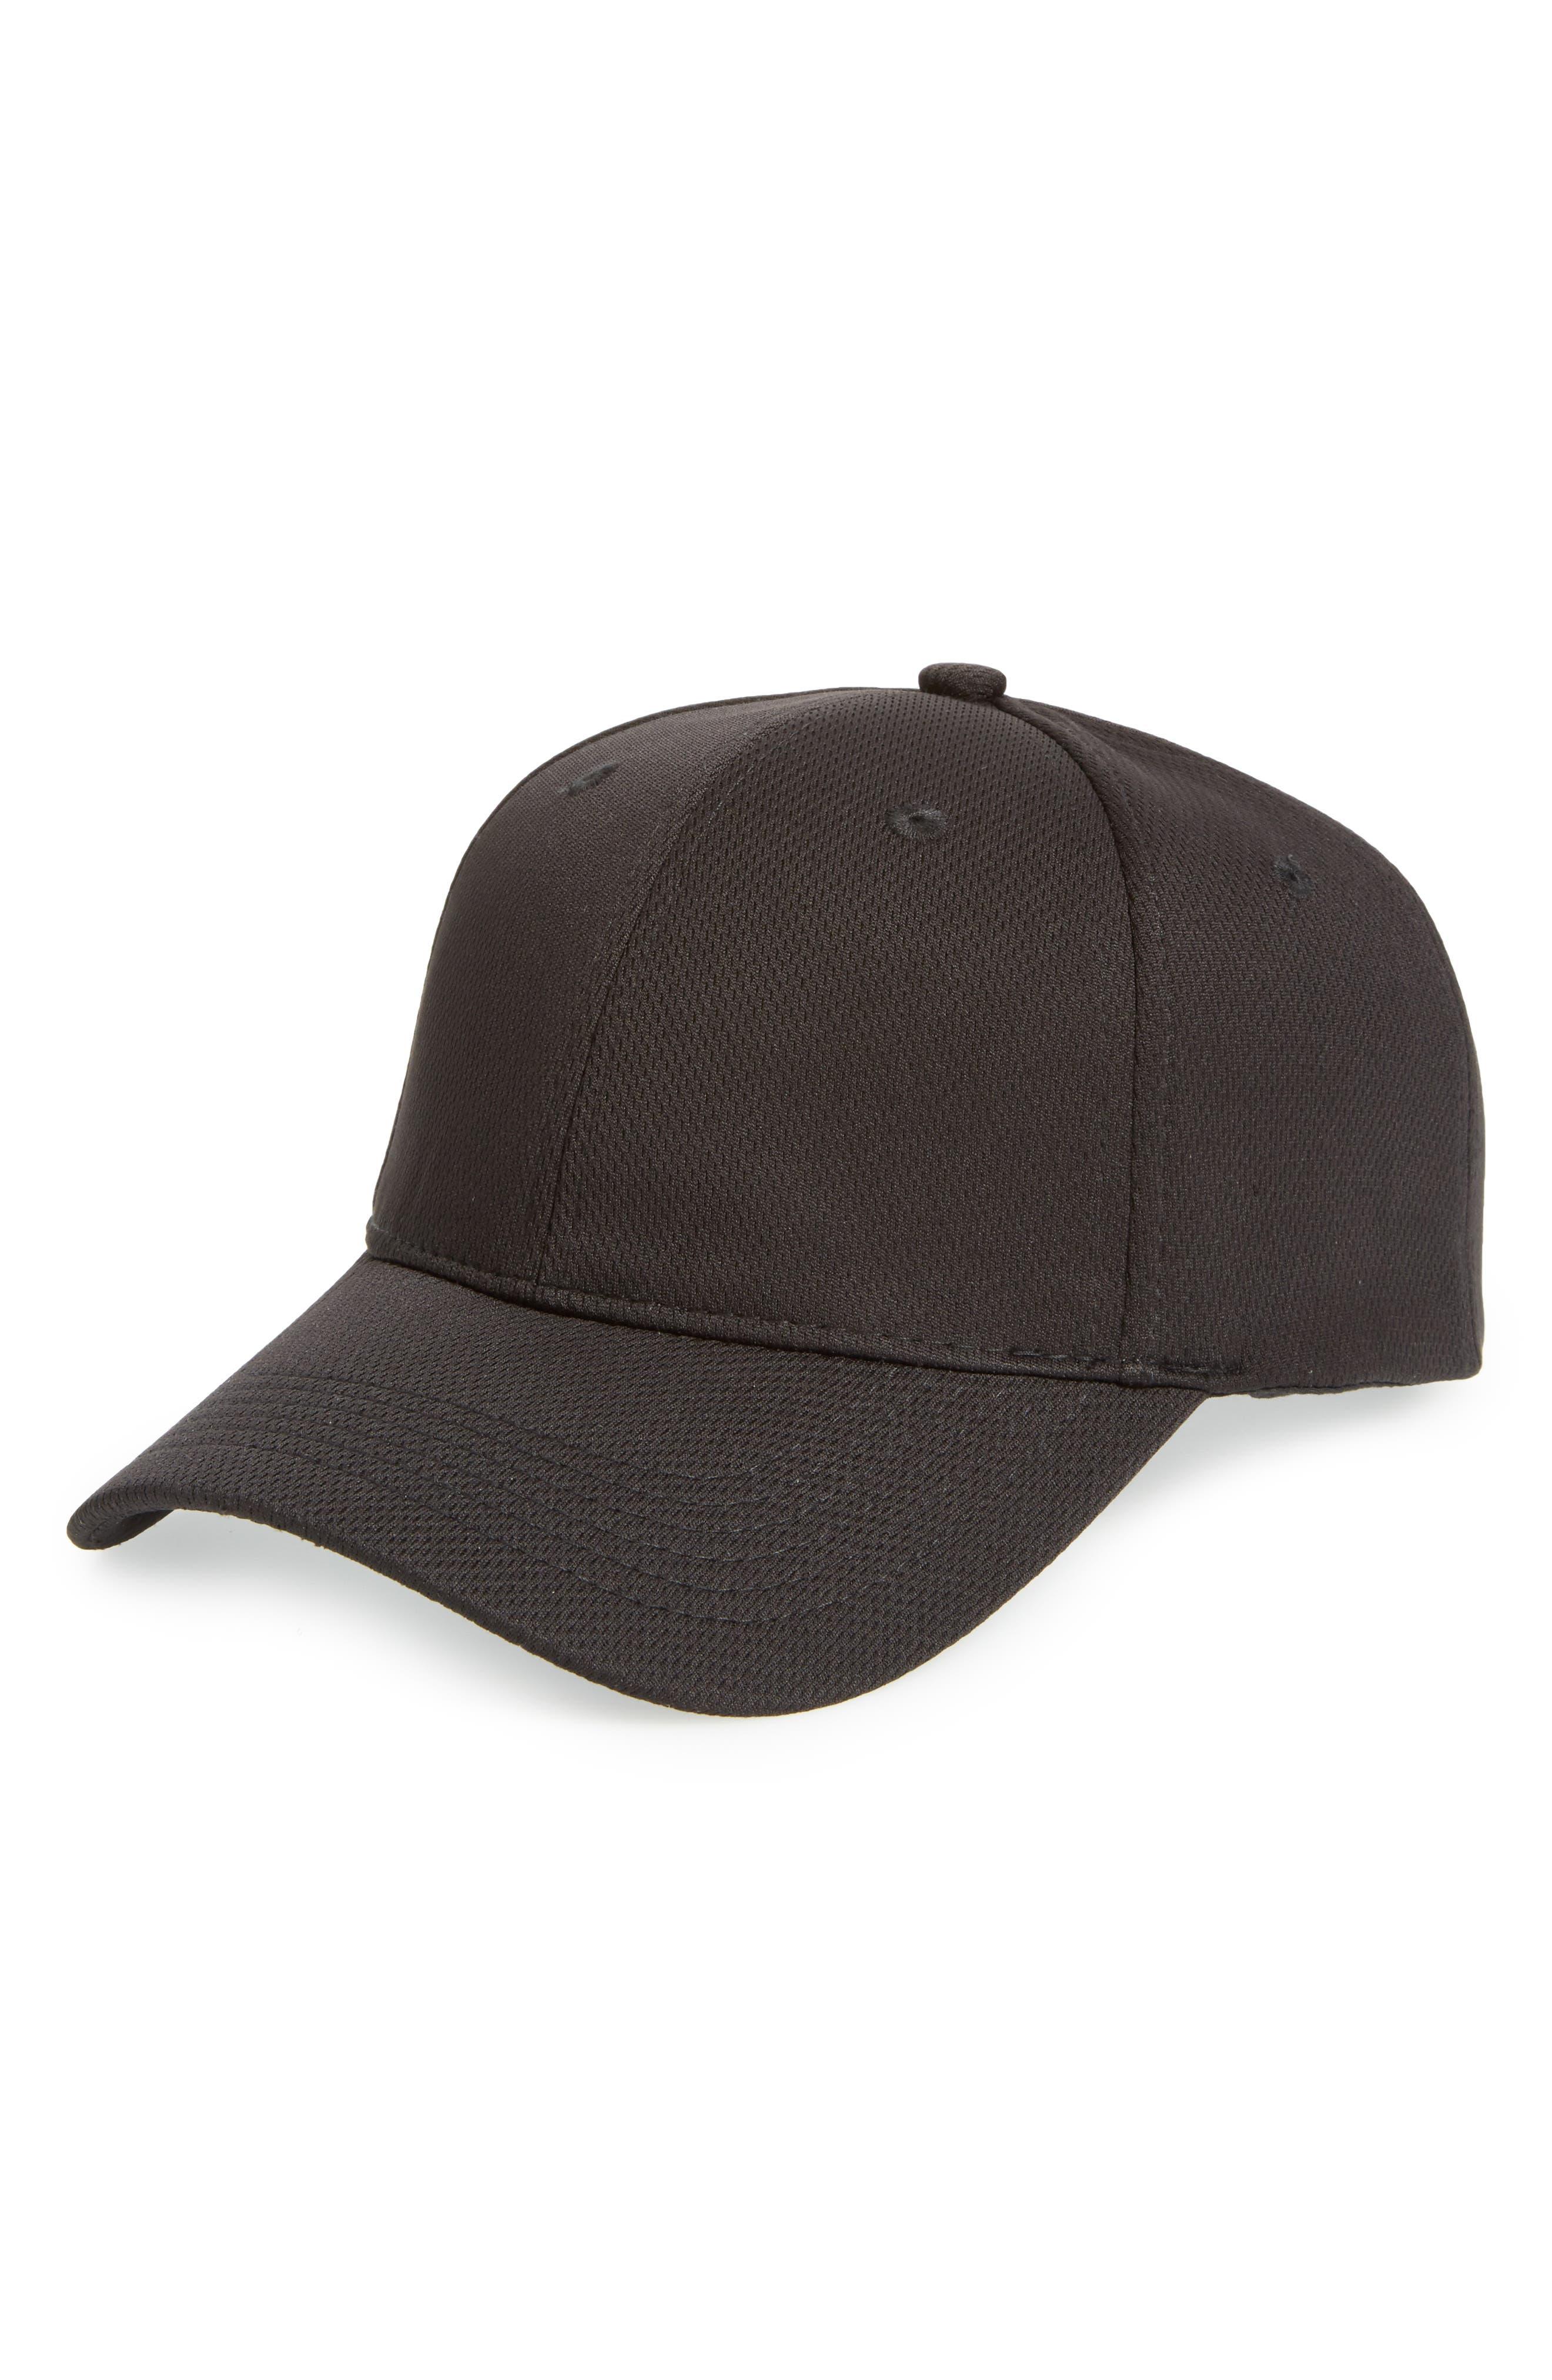 Alternate Image 1 Selected - Topshop Airtex Peak Baseball Cap